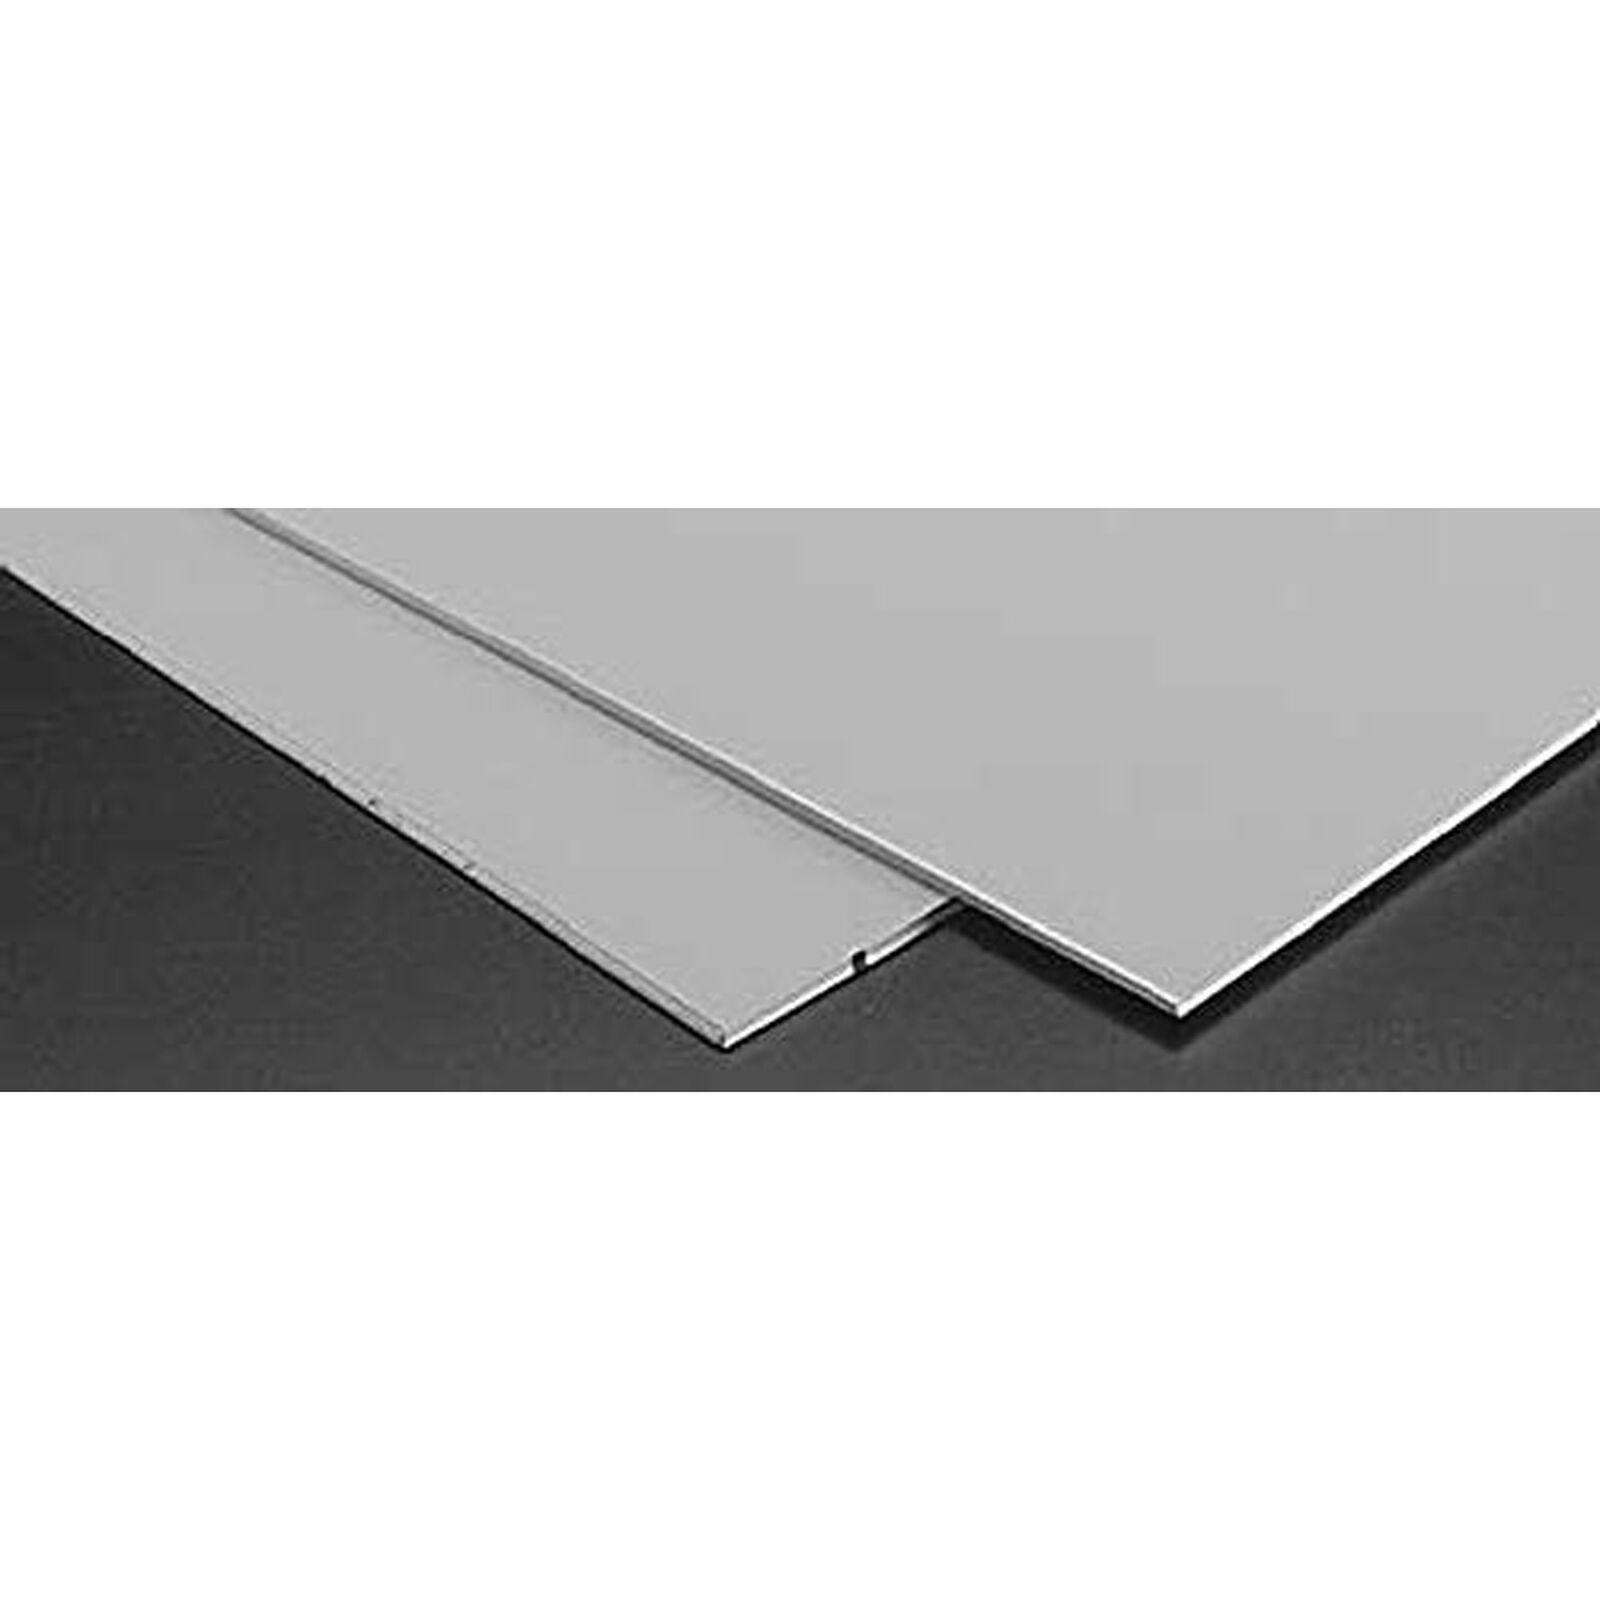 SSA-125 Gray ABS,.125 (2)